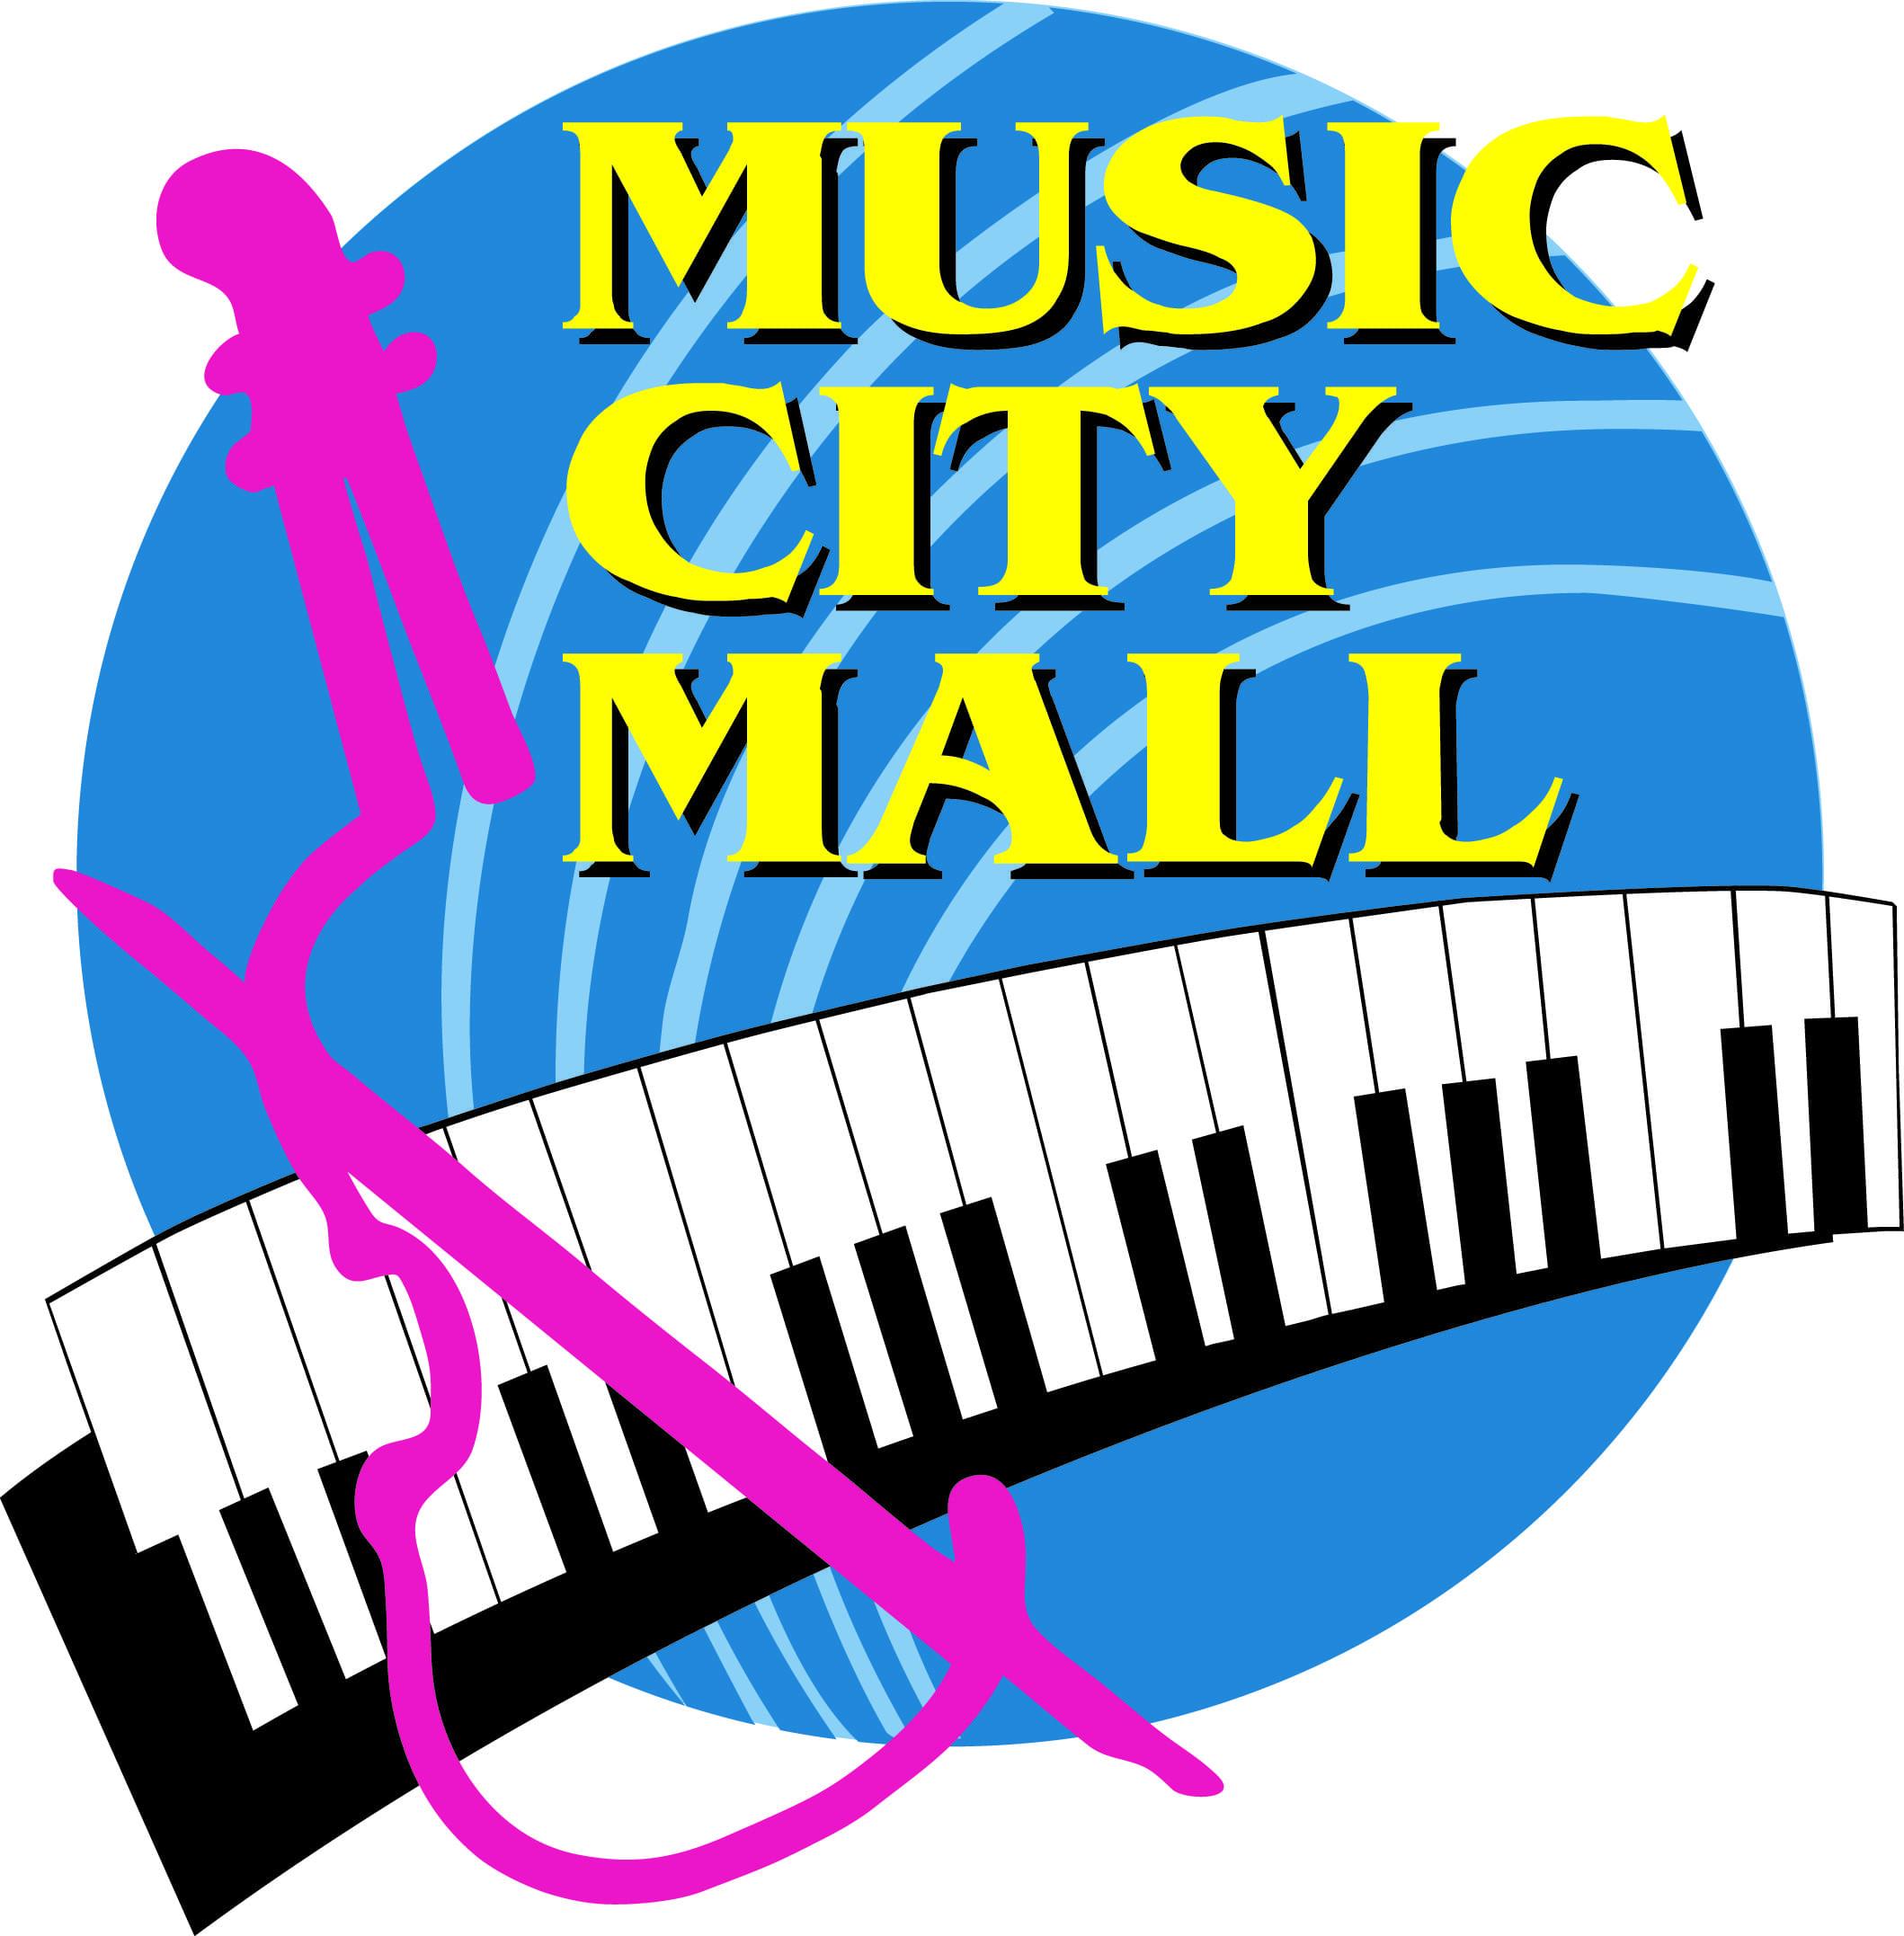 Music City Mall   11.16.19